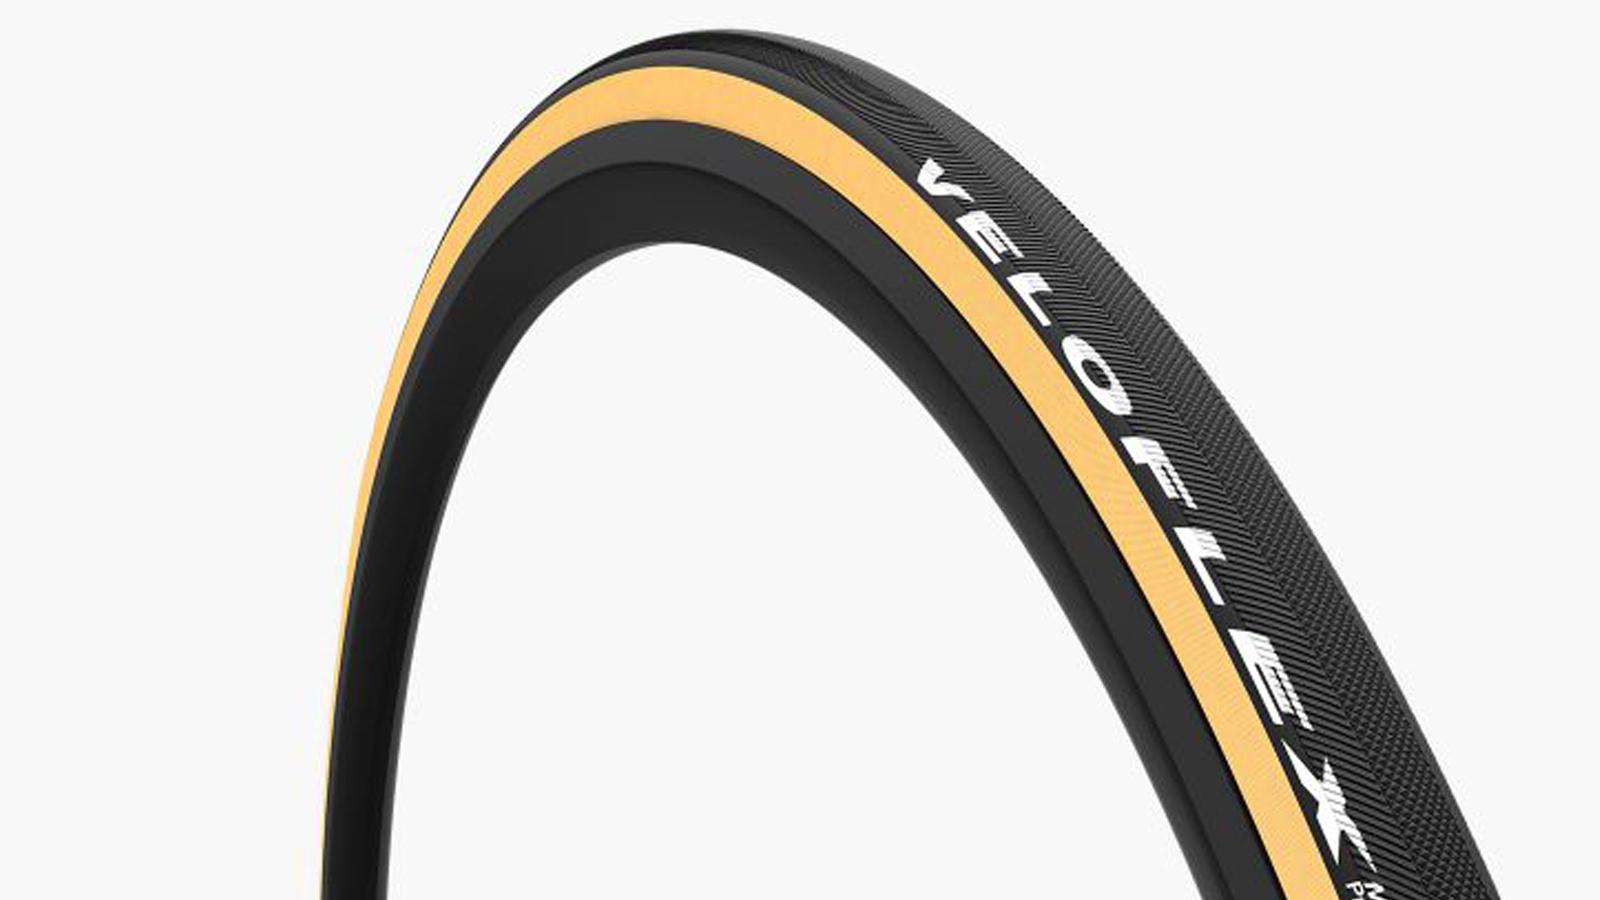 Best Road bike tyres: Veloflex Master 25 SPS